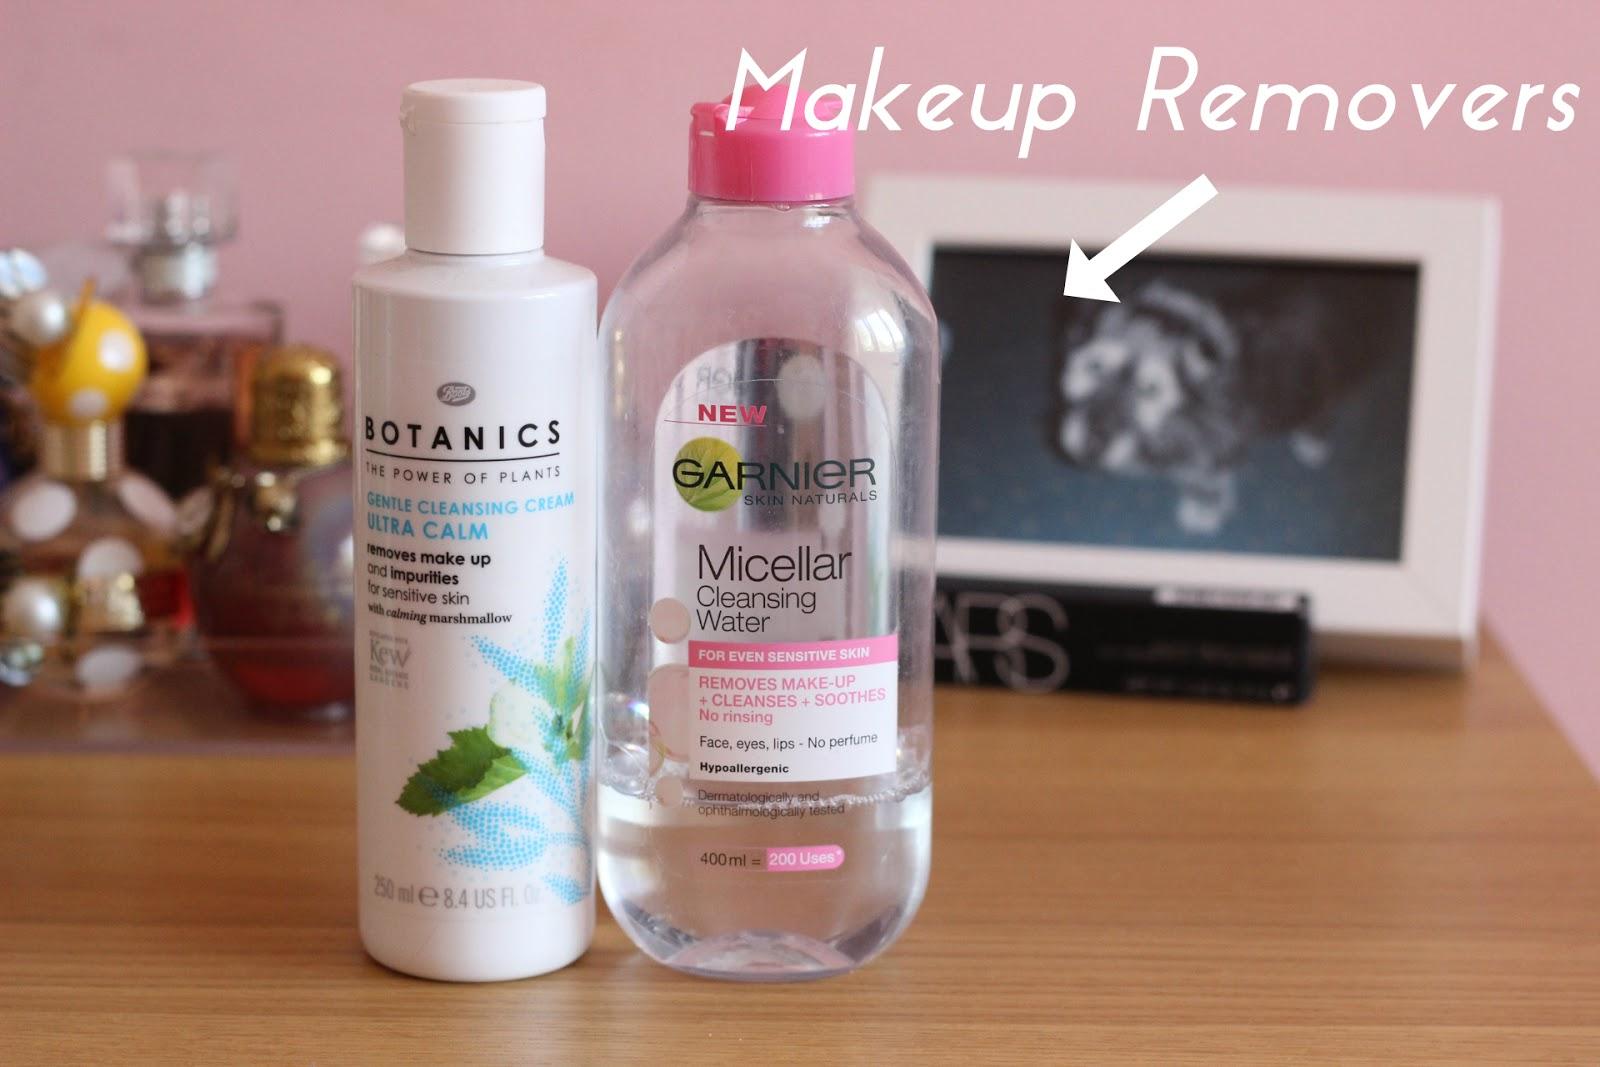 budget, skincare and makeup removers